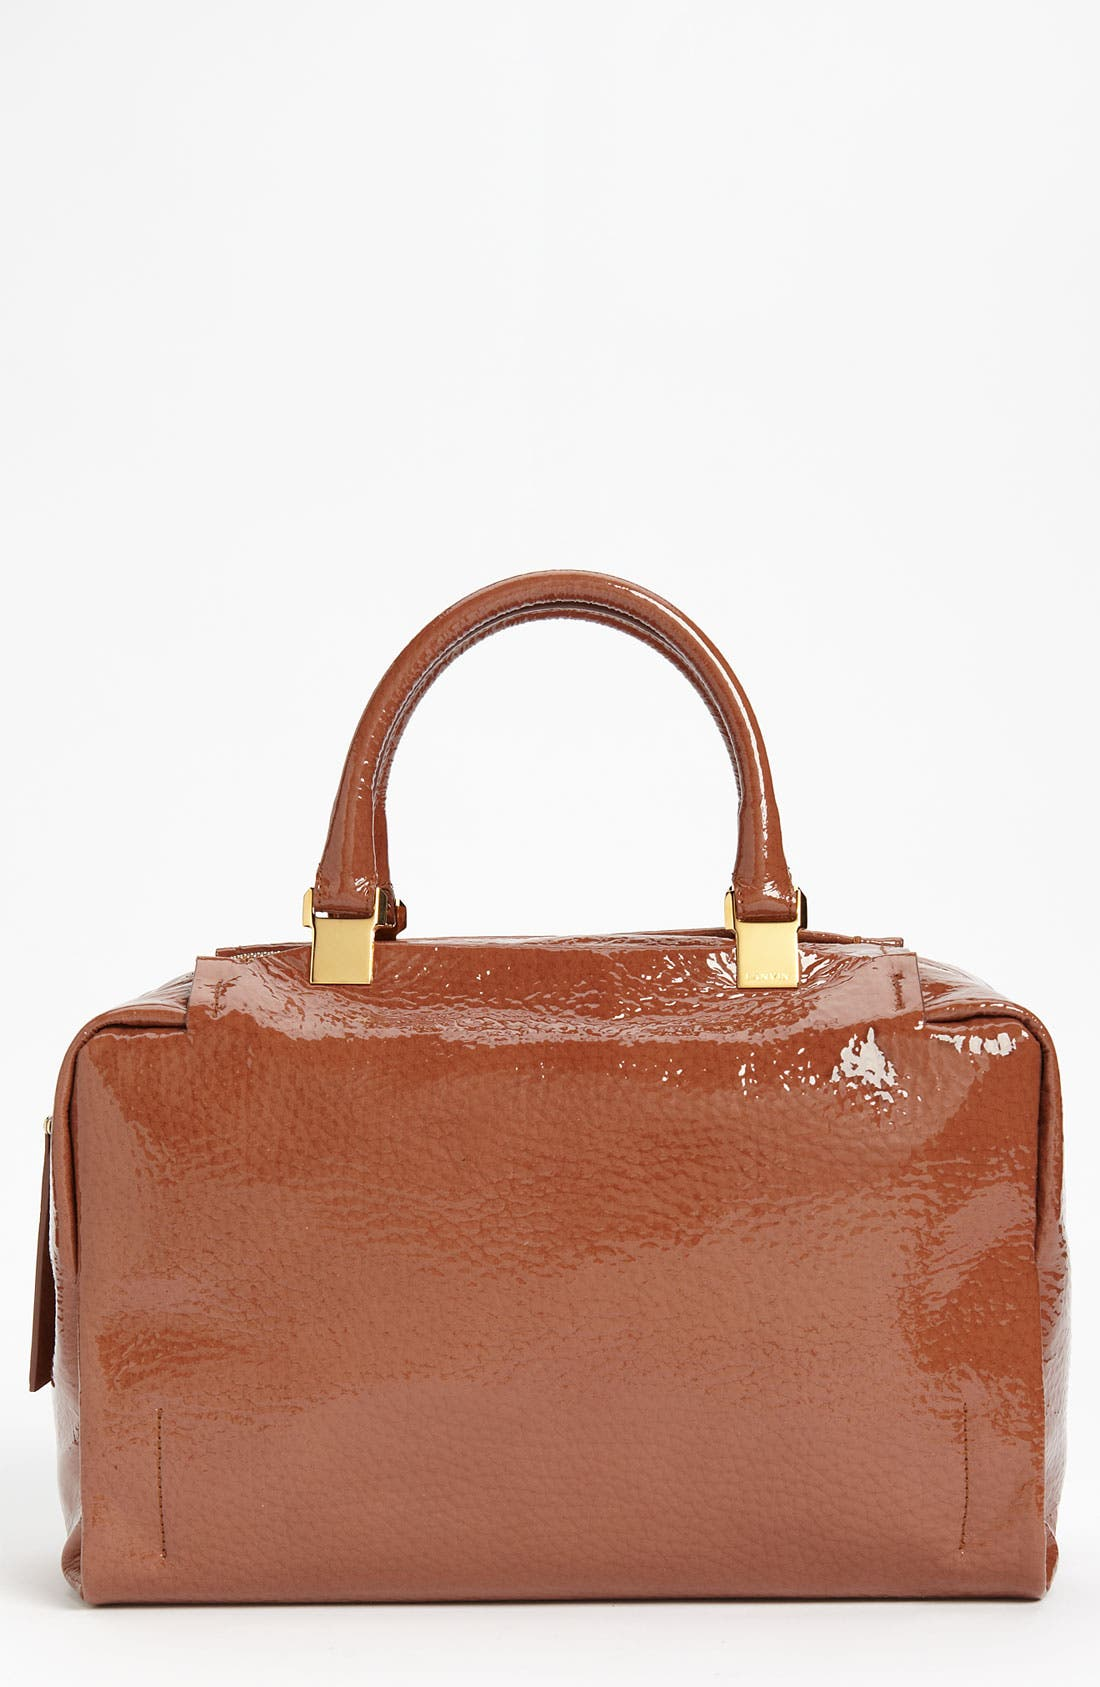 Main Image - Lanvin 'Moon River' Patent Leather Satchel